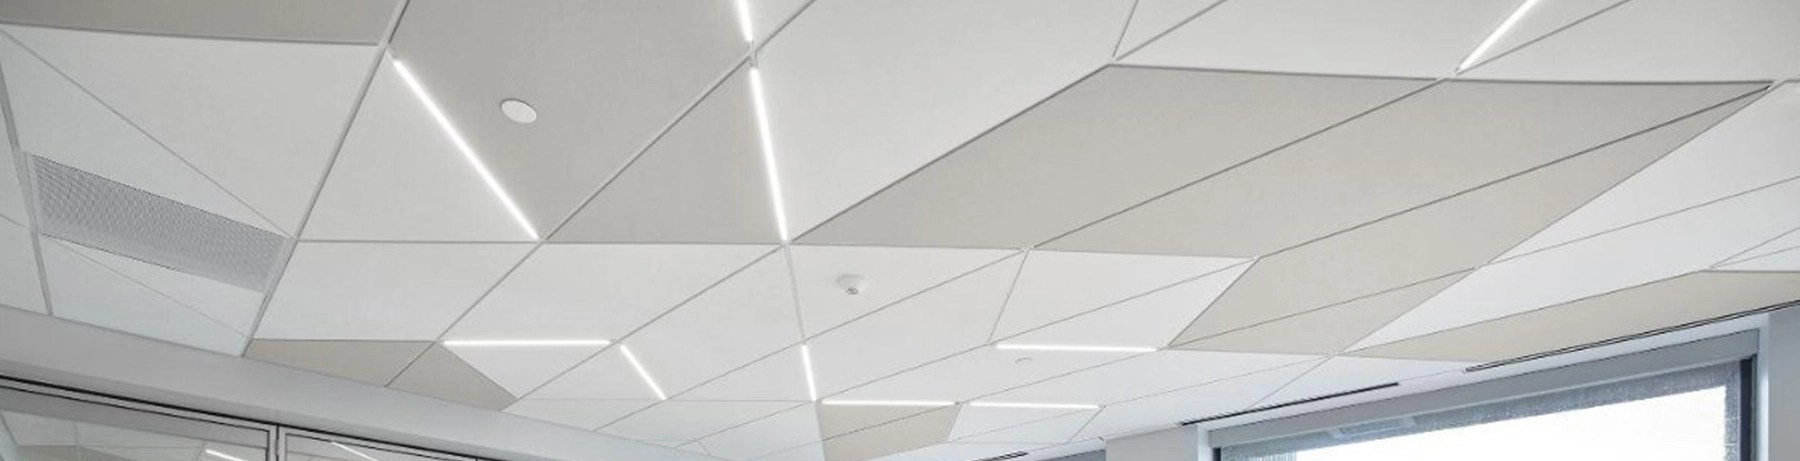 ceiling tiles burke interior systems ltd